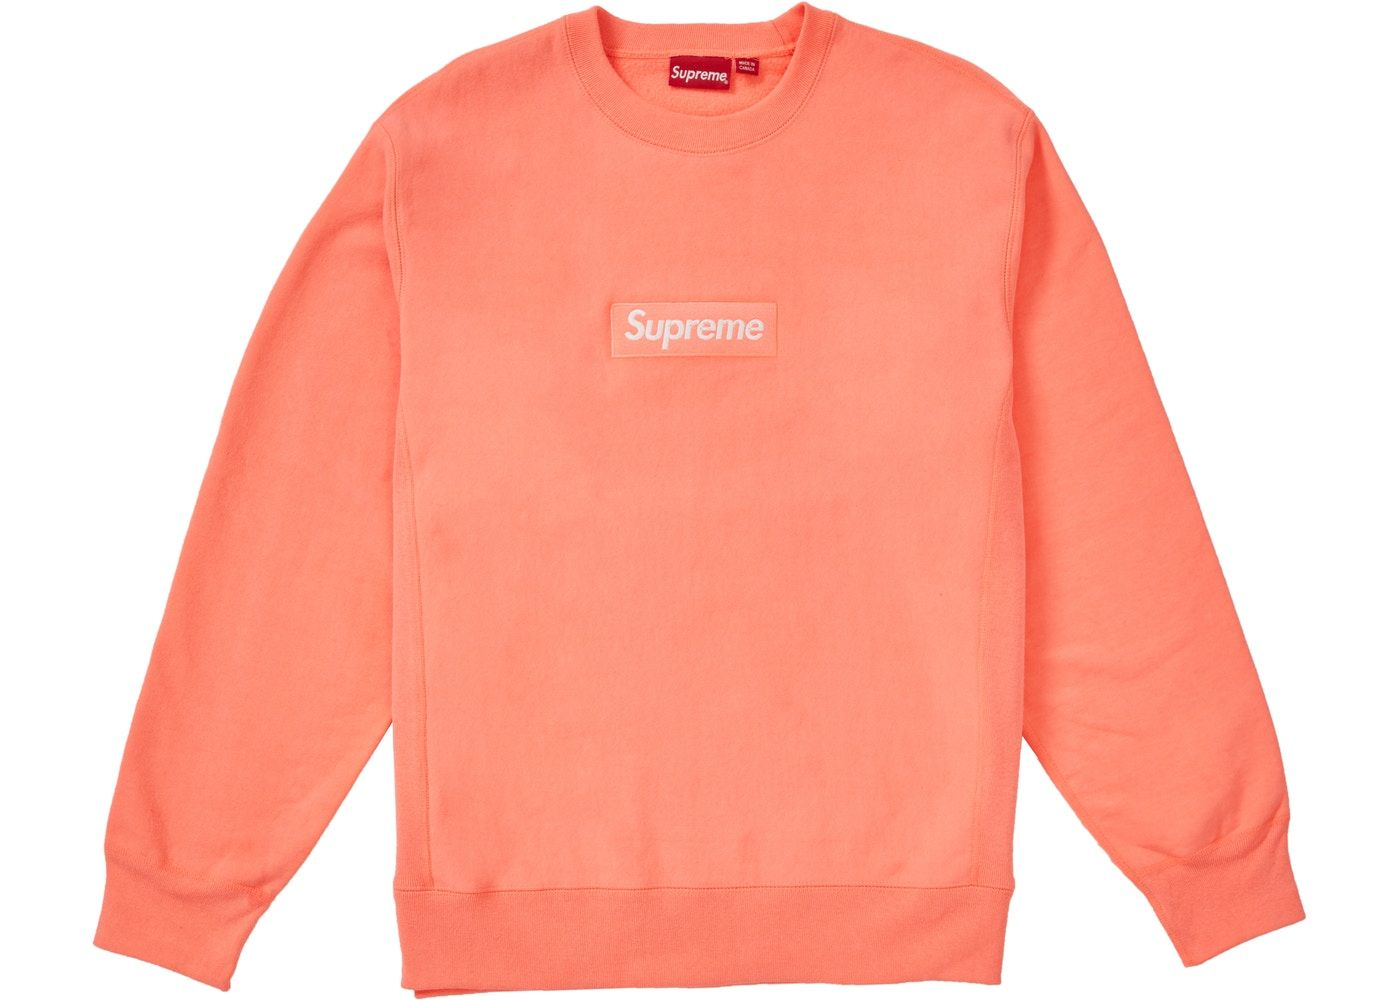 Supreme Box Logo Crewneck (FW18) Fluorescent Pink in 2020